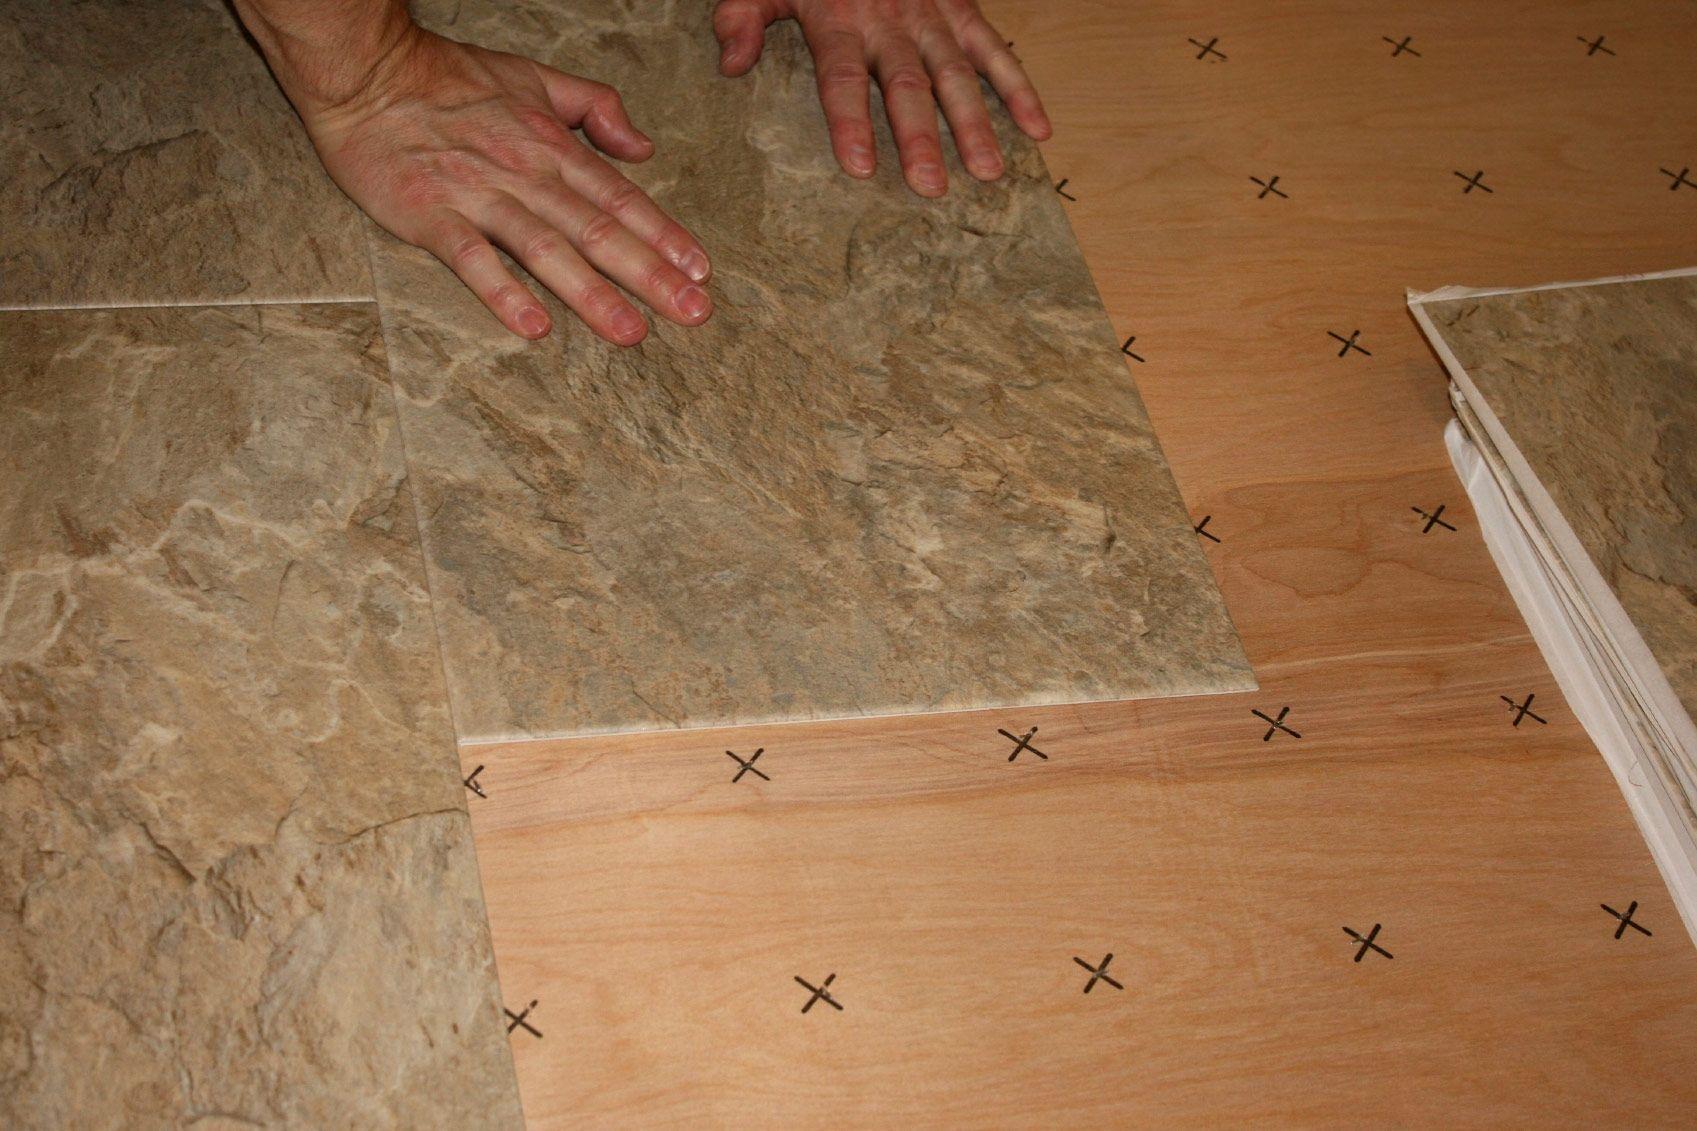 Adhesive Backed Vinyl Floor Tiles Httpnextsoftcom - Adhesive backed vinyl tiles